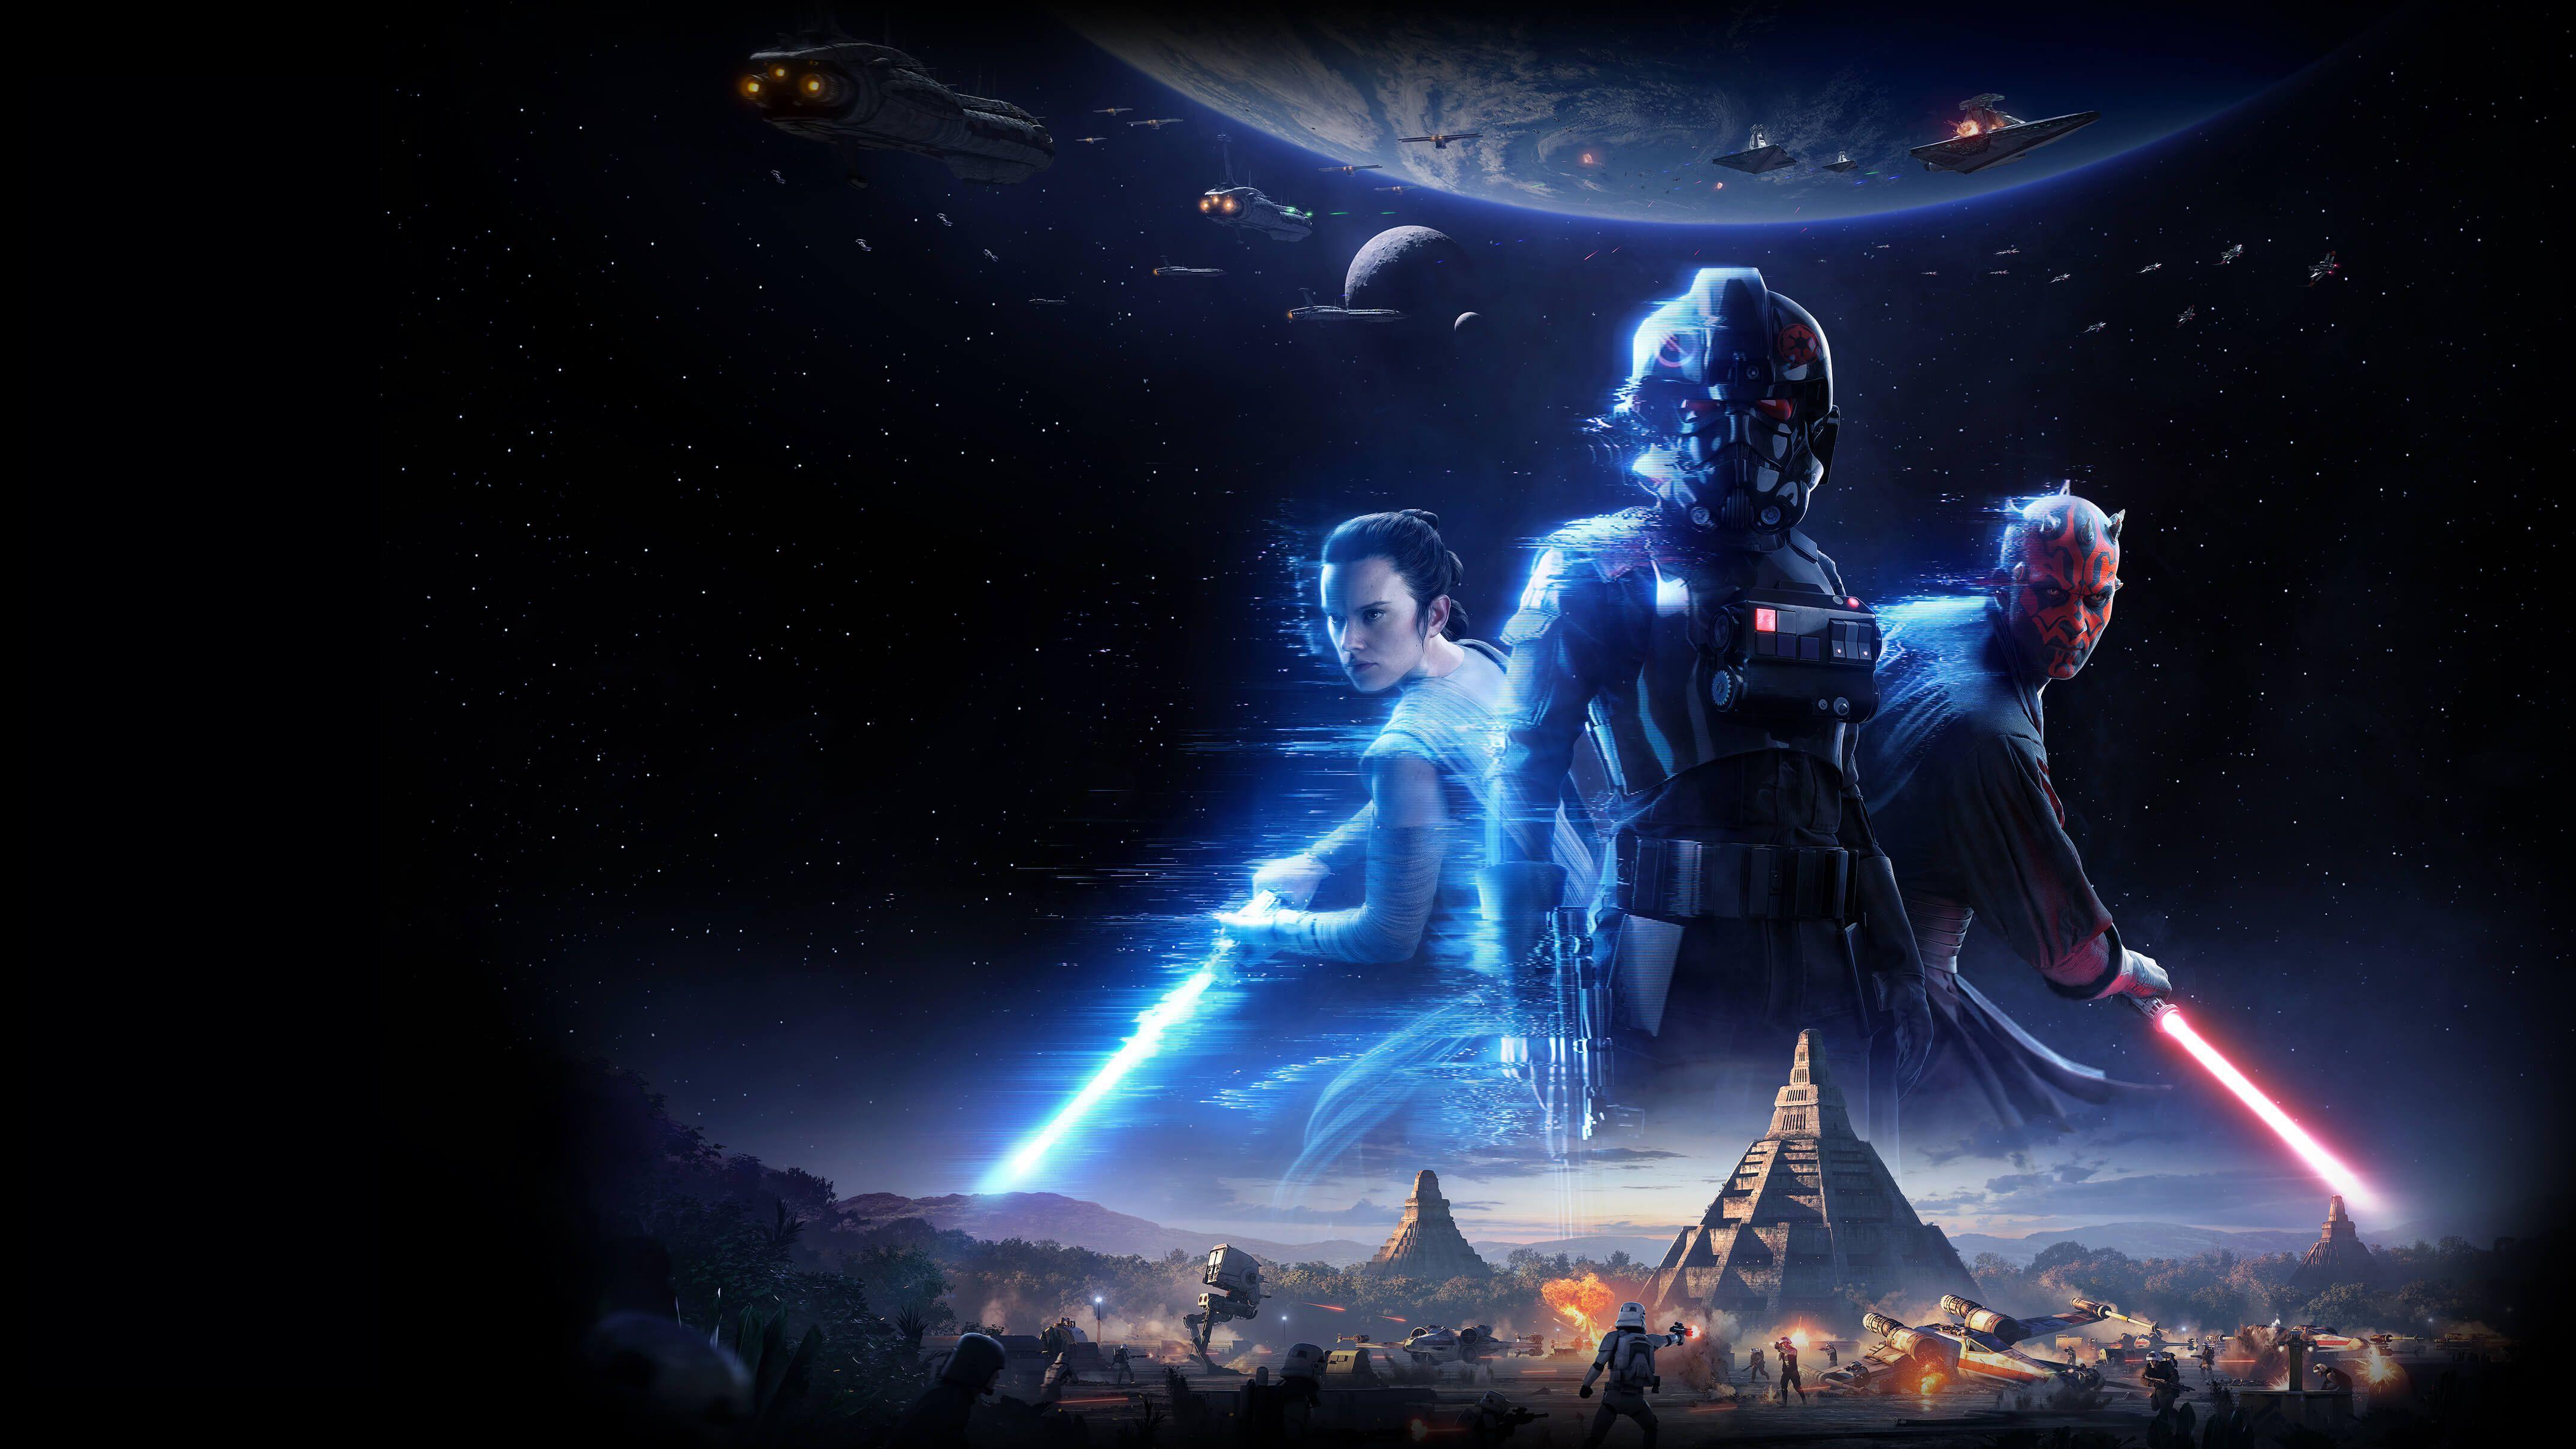 Star Wars Battlefront Ii Wallpapers Wallpaper Cave